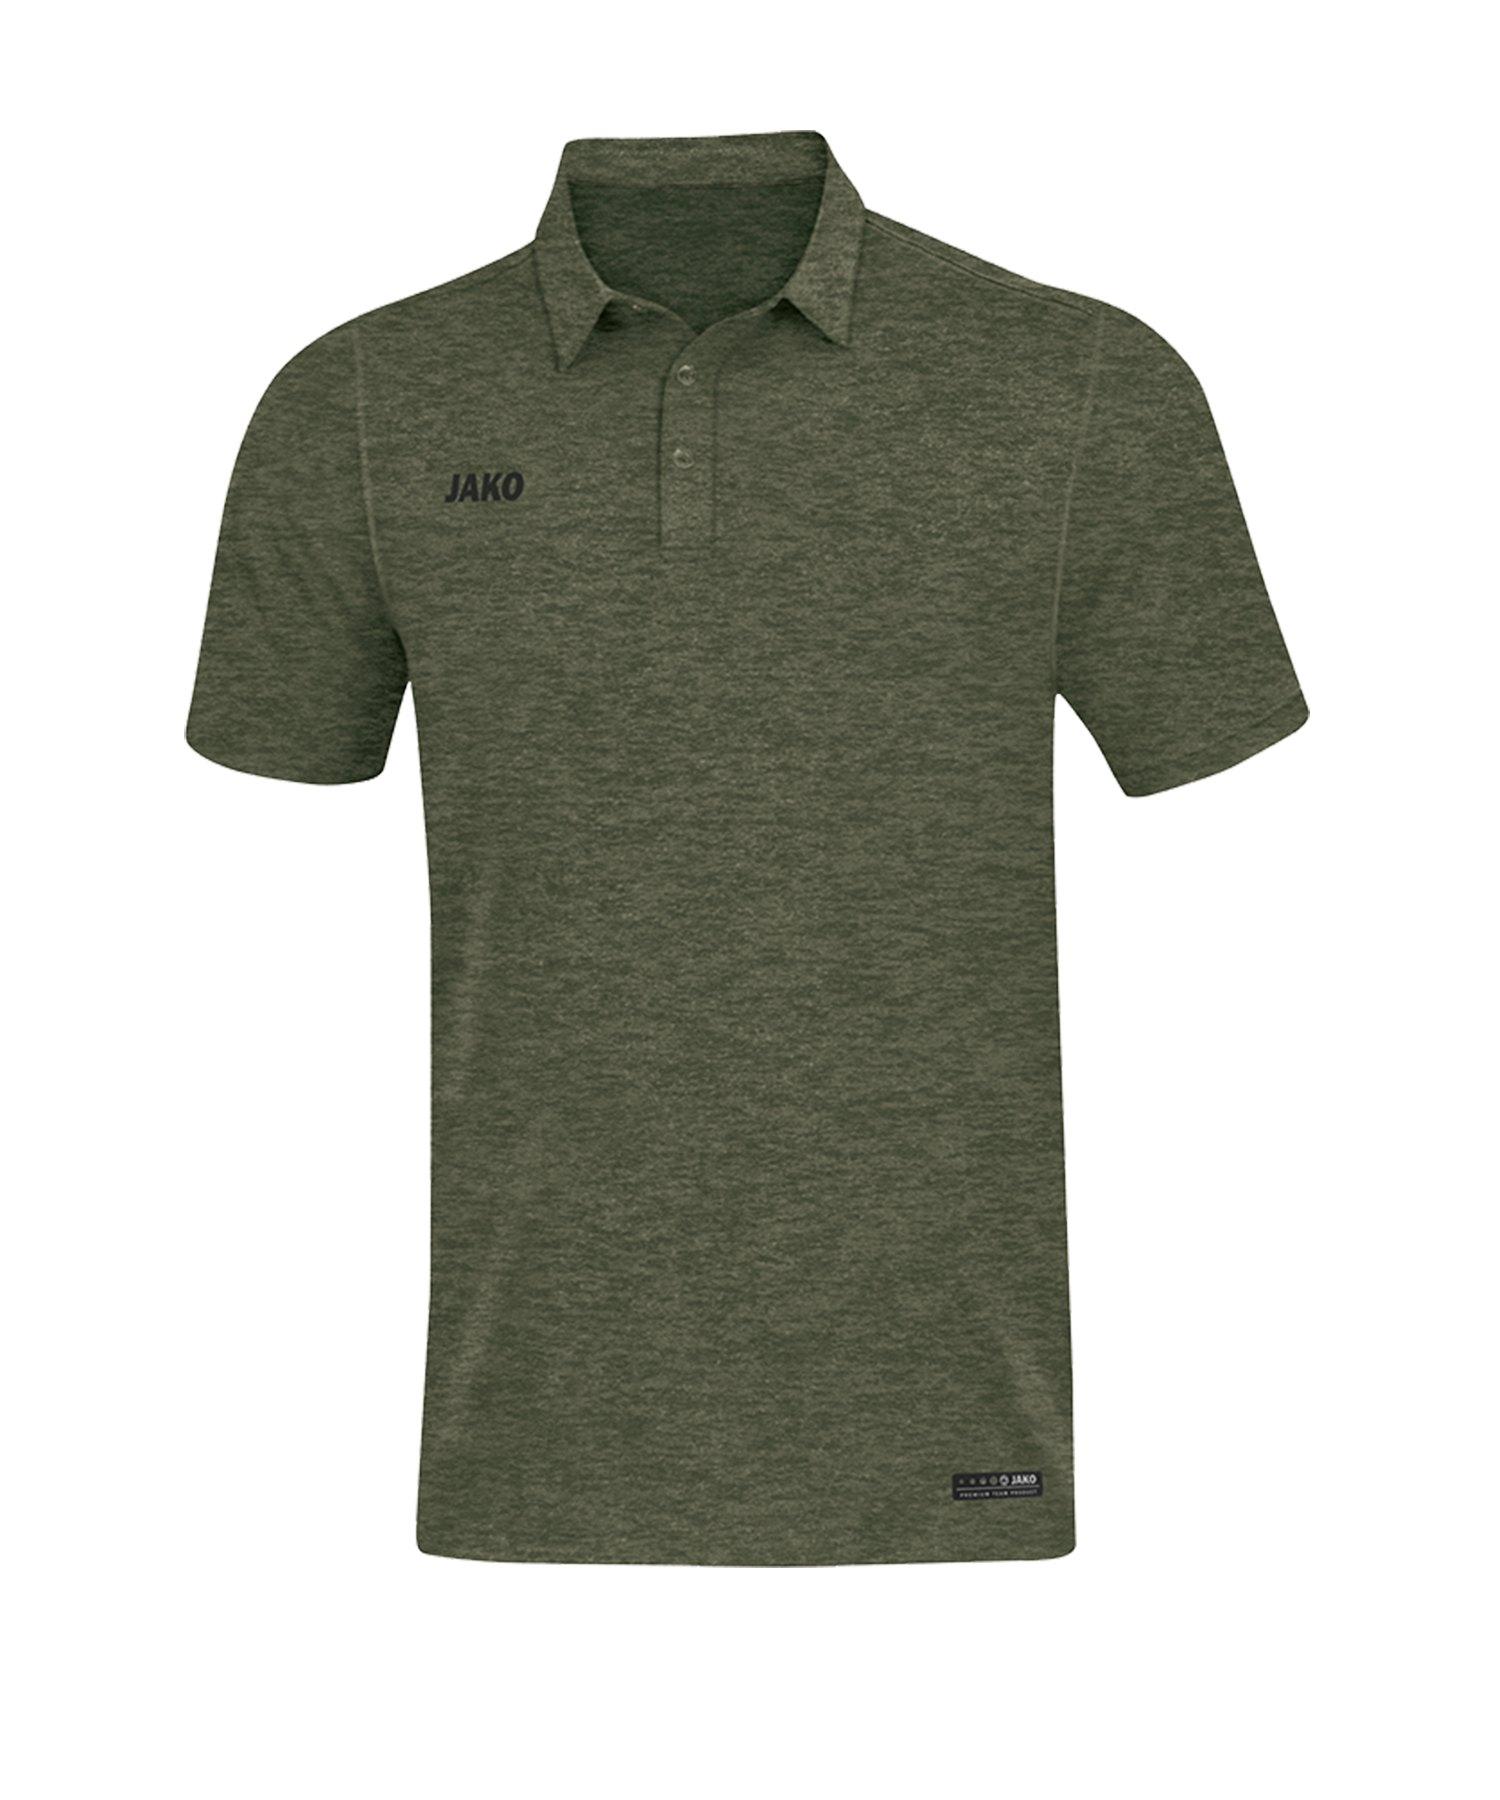 Jako Premium Basics Poloshirt Khaki F28 - Khaki